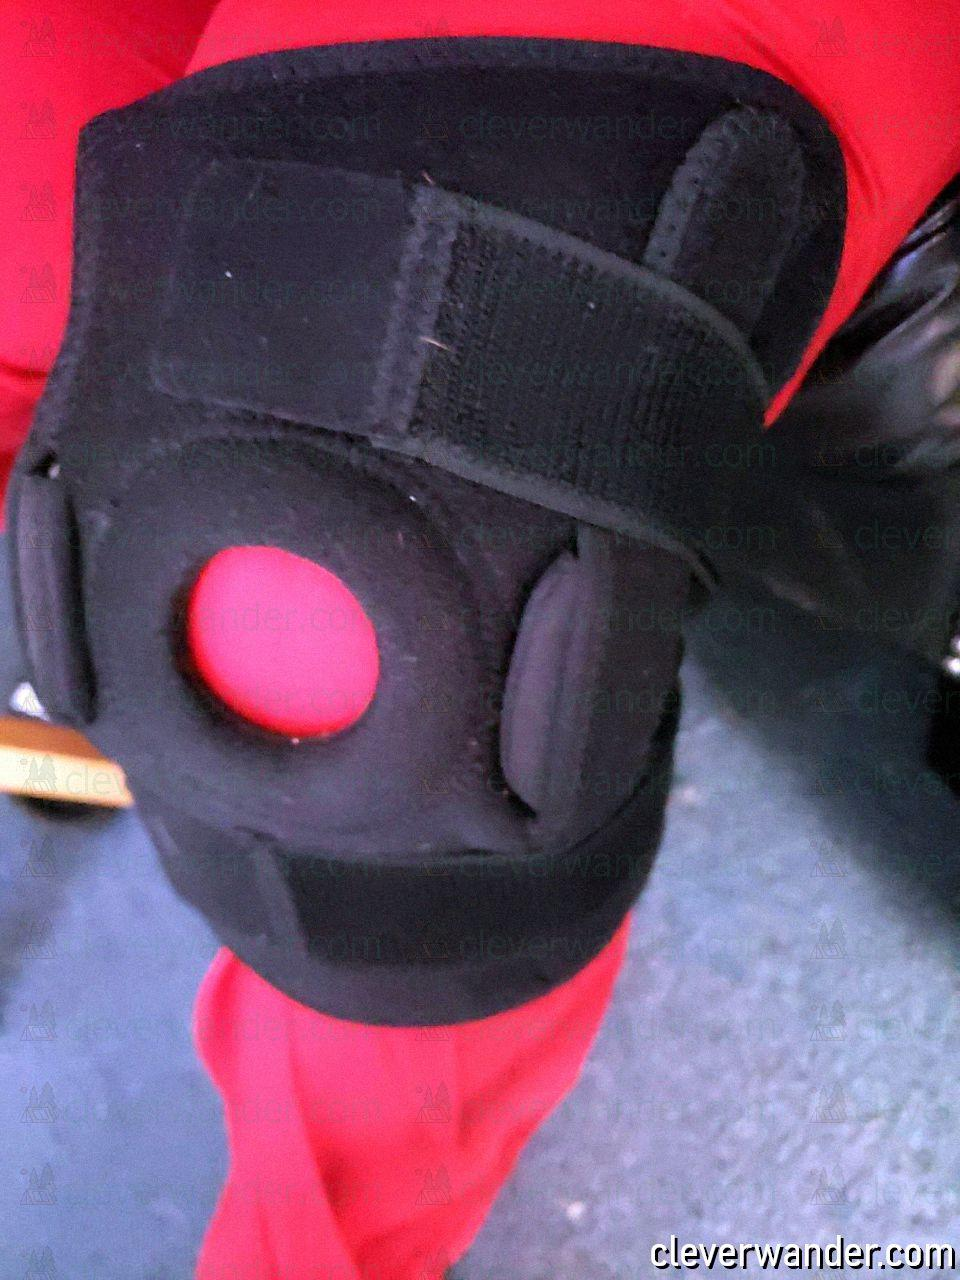 Vive Hinged Knee Brace - image review 1